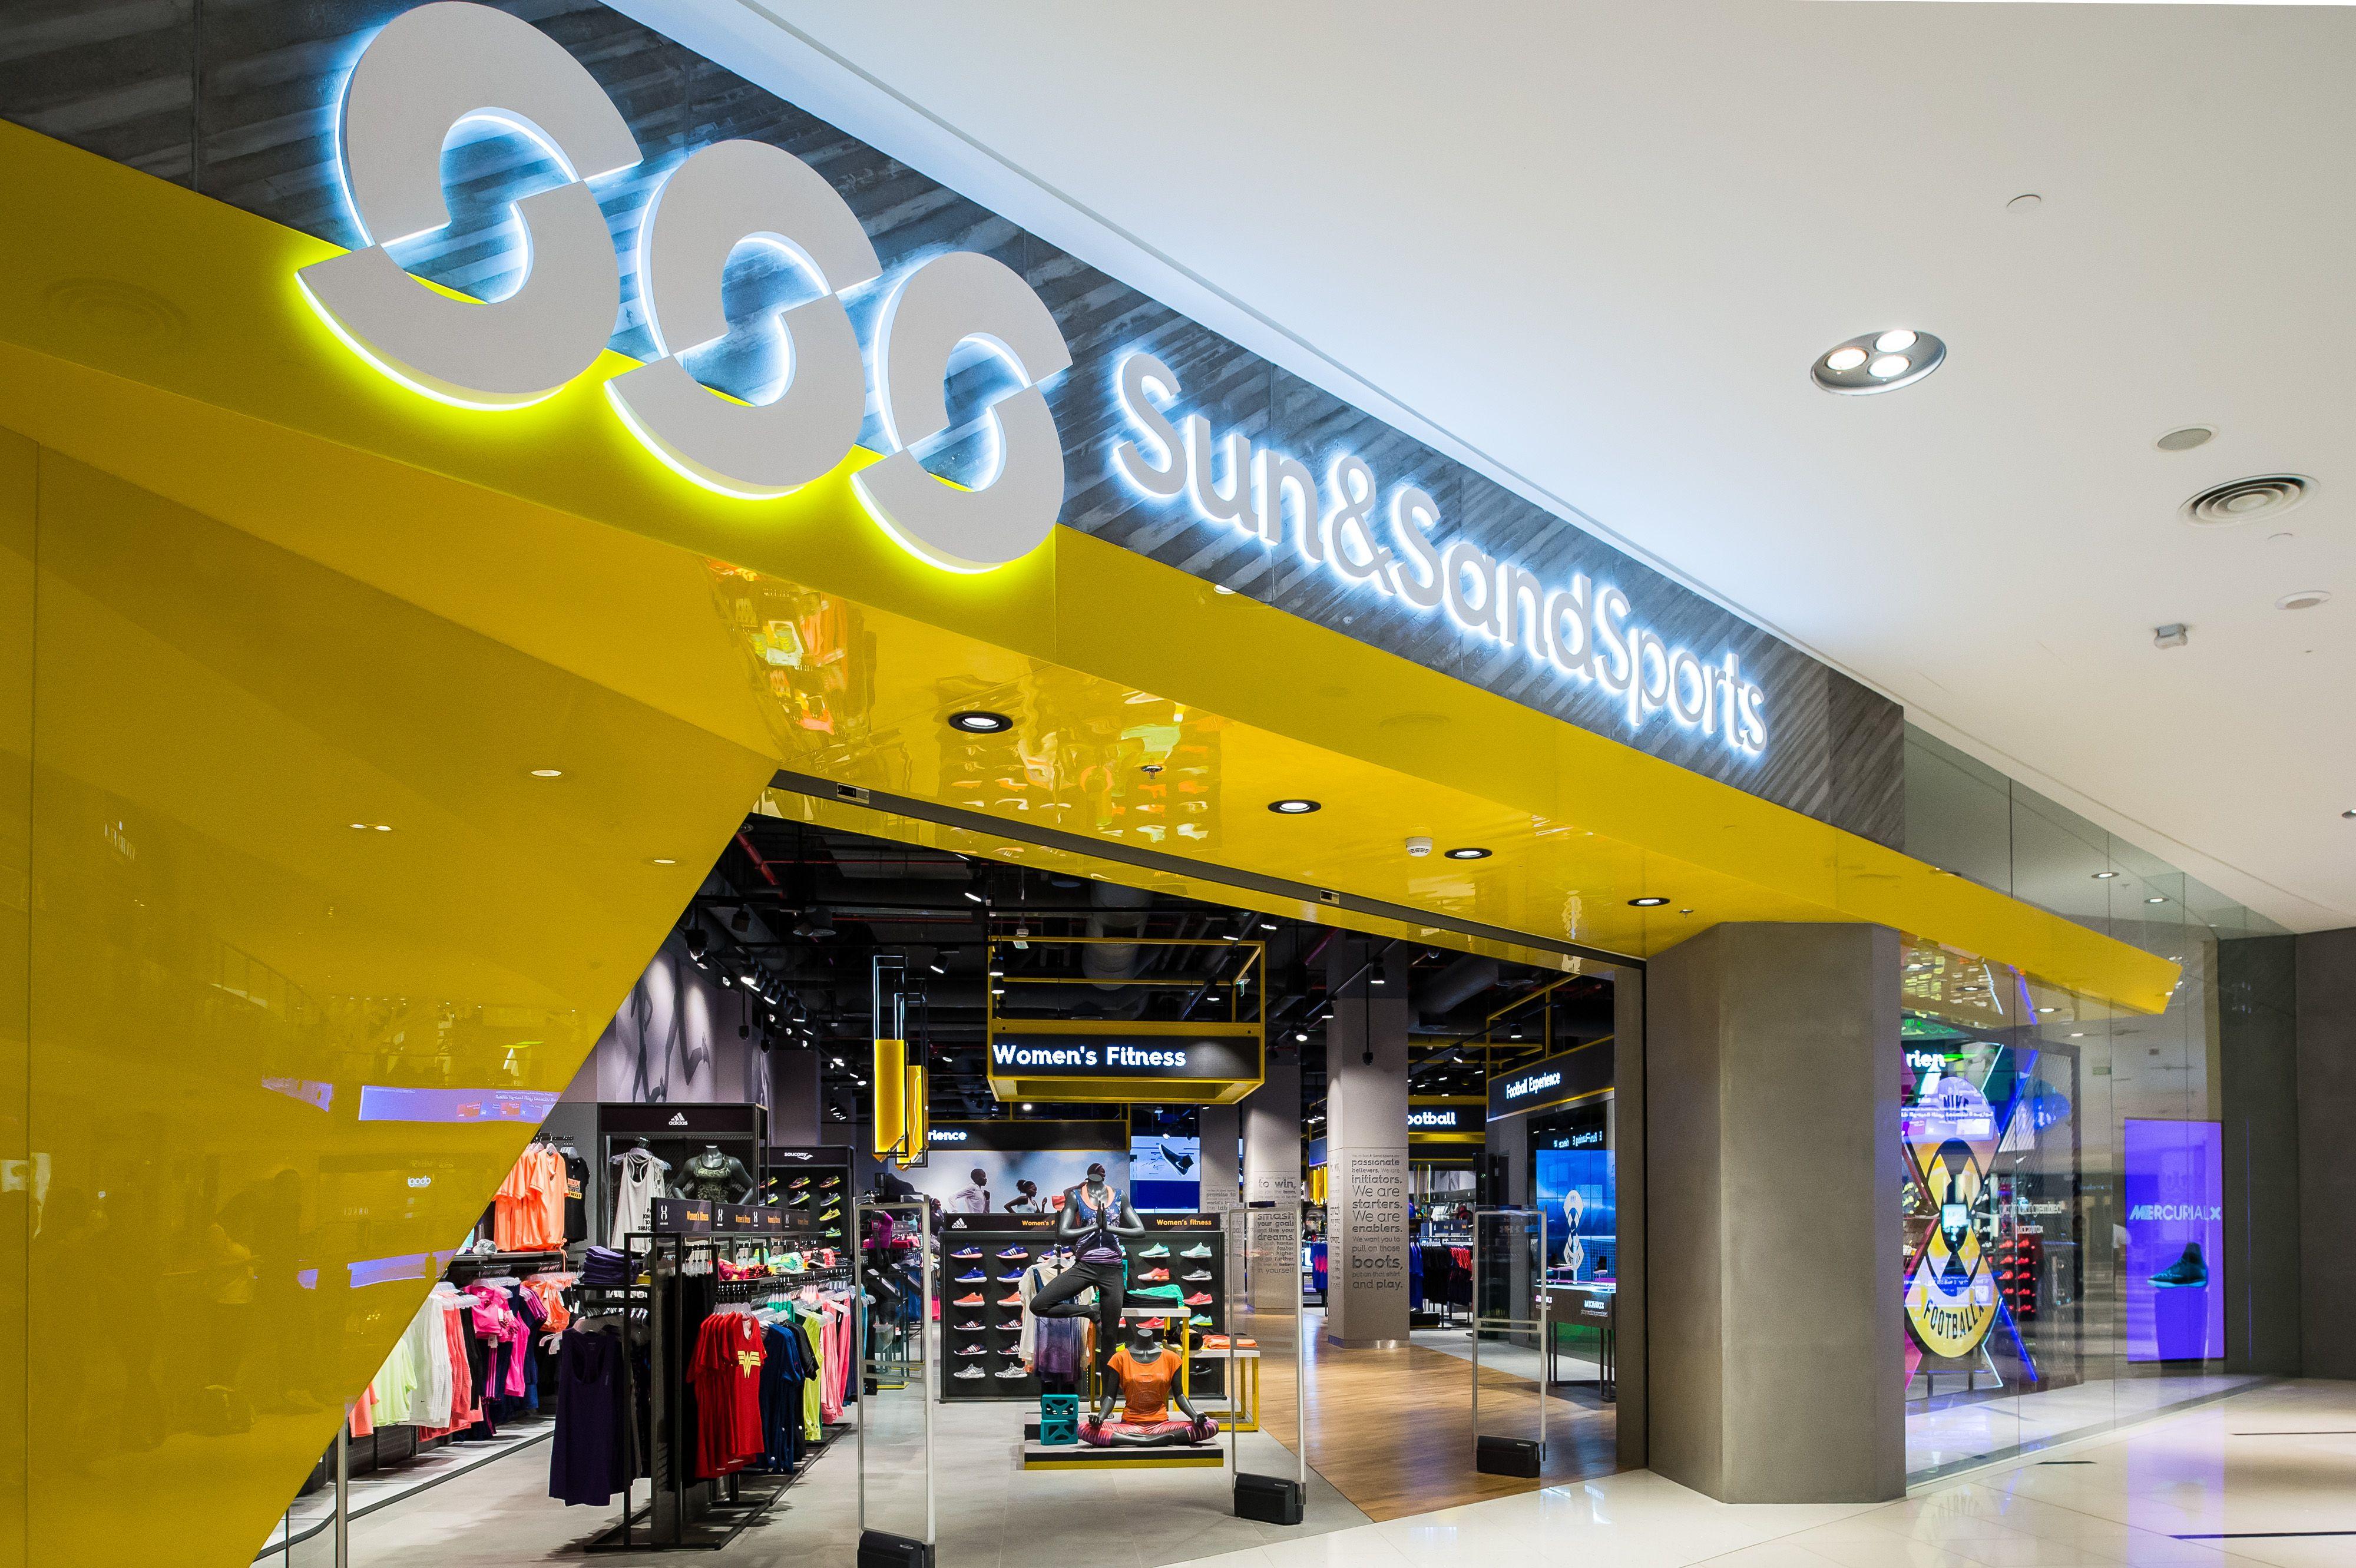 The Dubai Mall (دبي مول) 服装店, 建築, 儿童